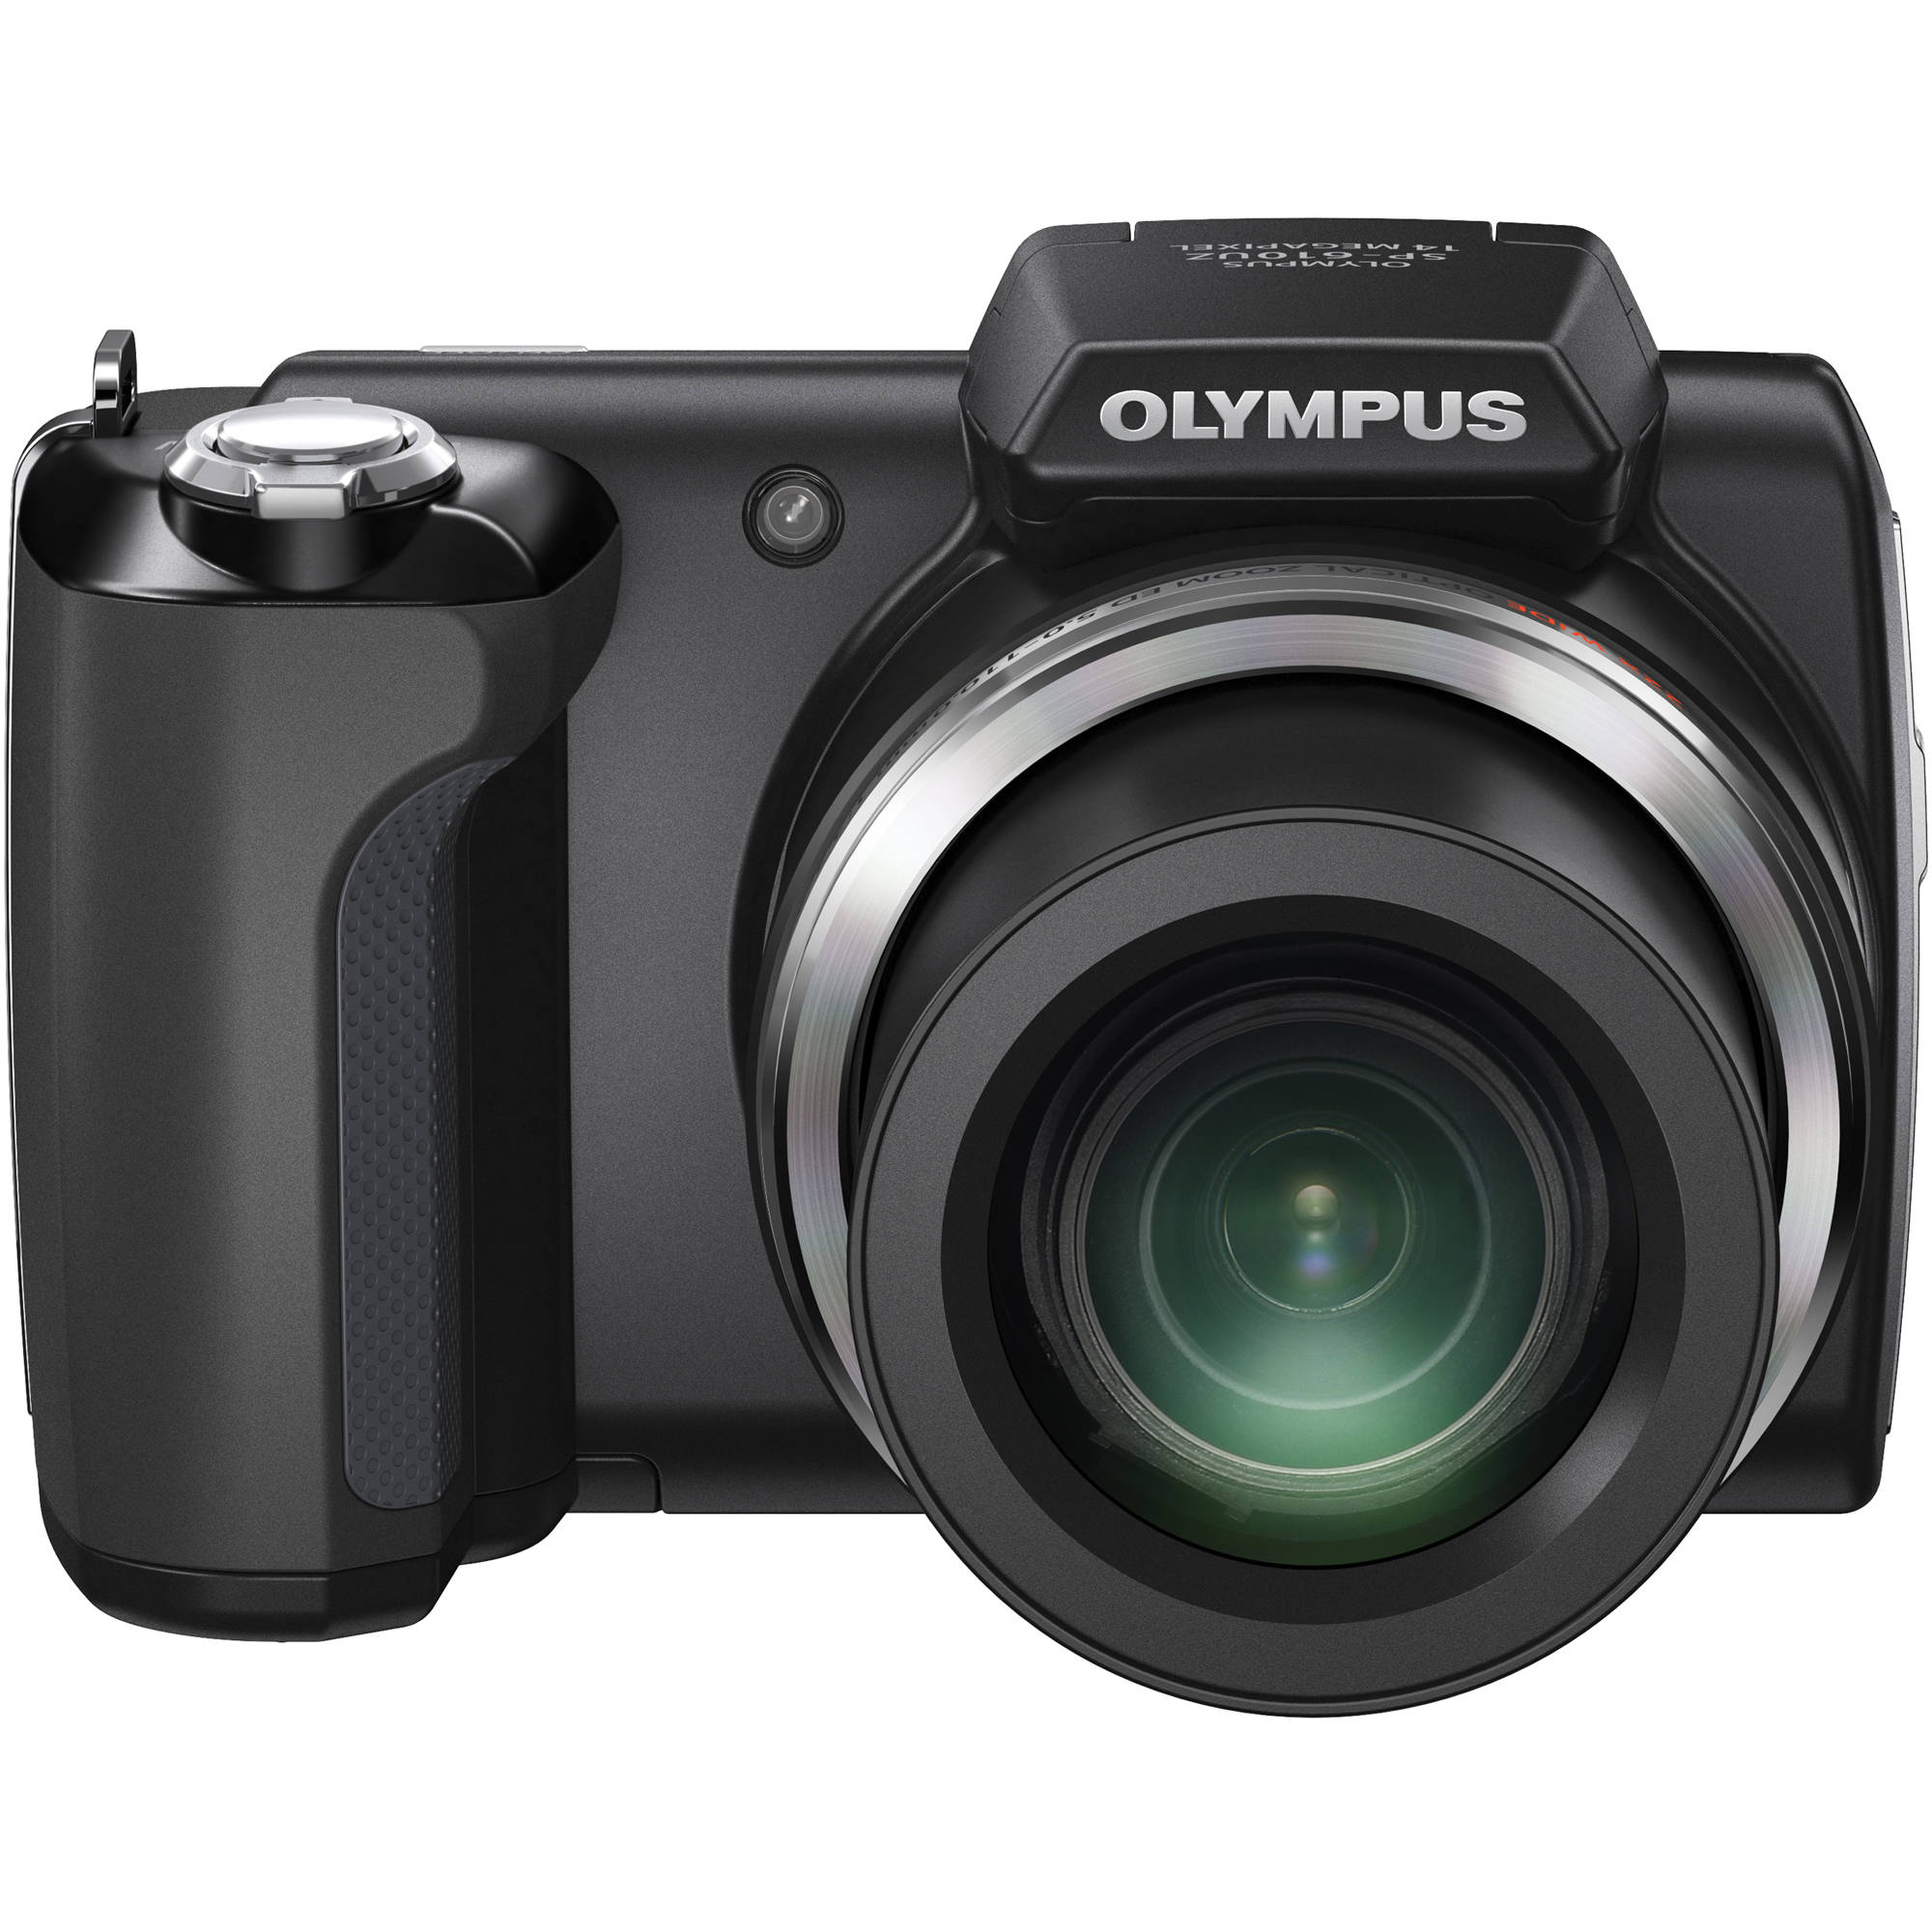 olympus sp 610uz digital camera black 228046 b h photo video rh bhphotovideo com Olympus Camera SP-600UZ Olympus Camera SP-600UZ